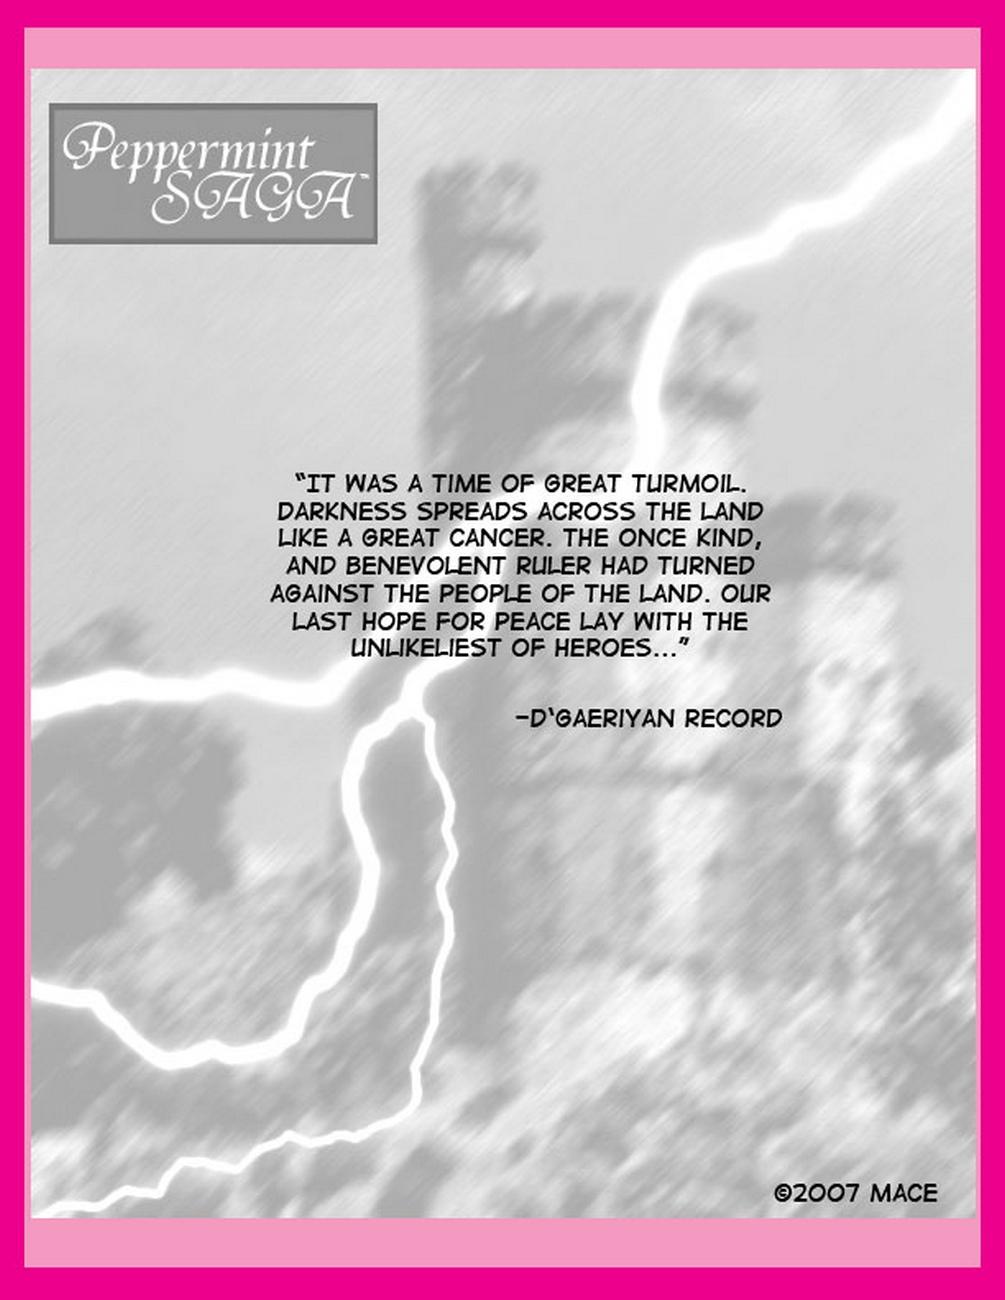 Peppermint-Saga-1-The-Sword-Of-Truth 2 free sex comic